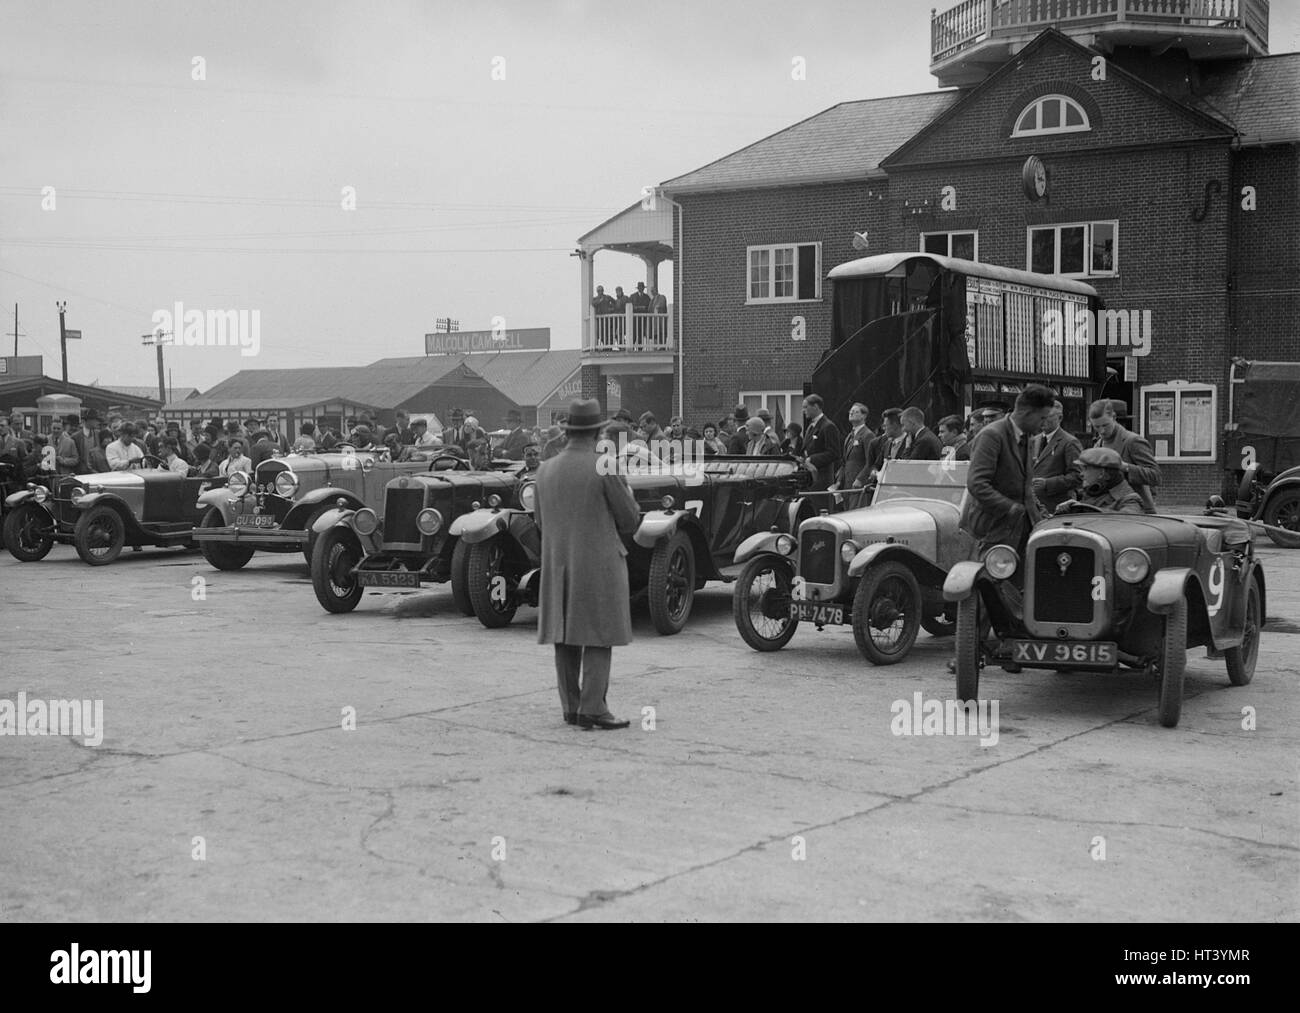 Cars at Brooklands, Surrey, c1930s. Artist: Bill Brunell. - Stock Image